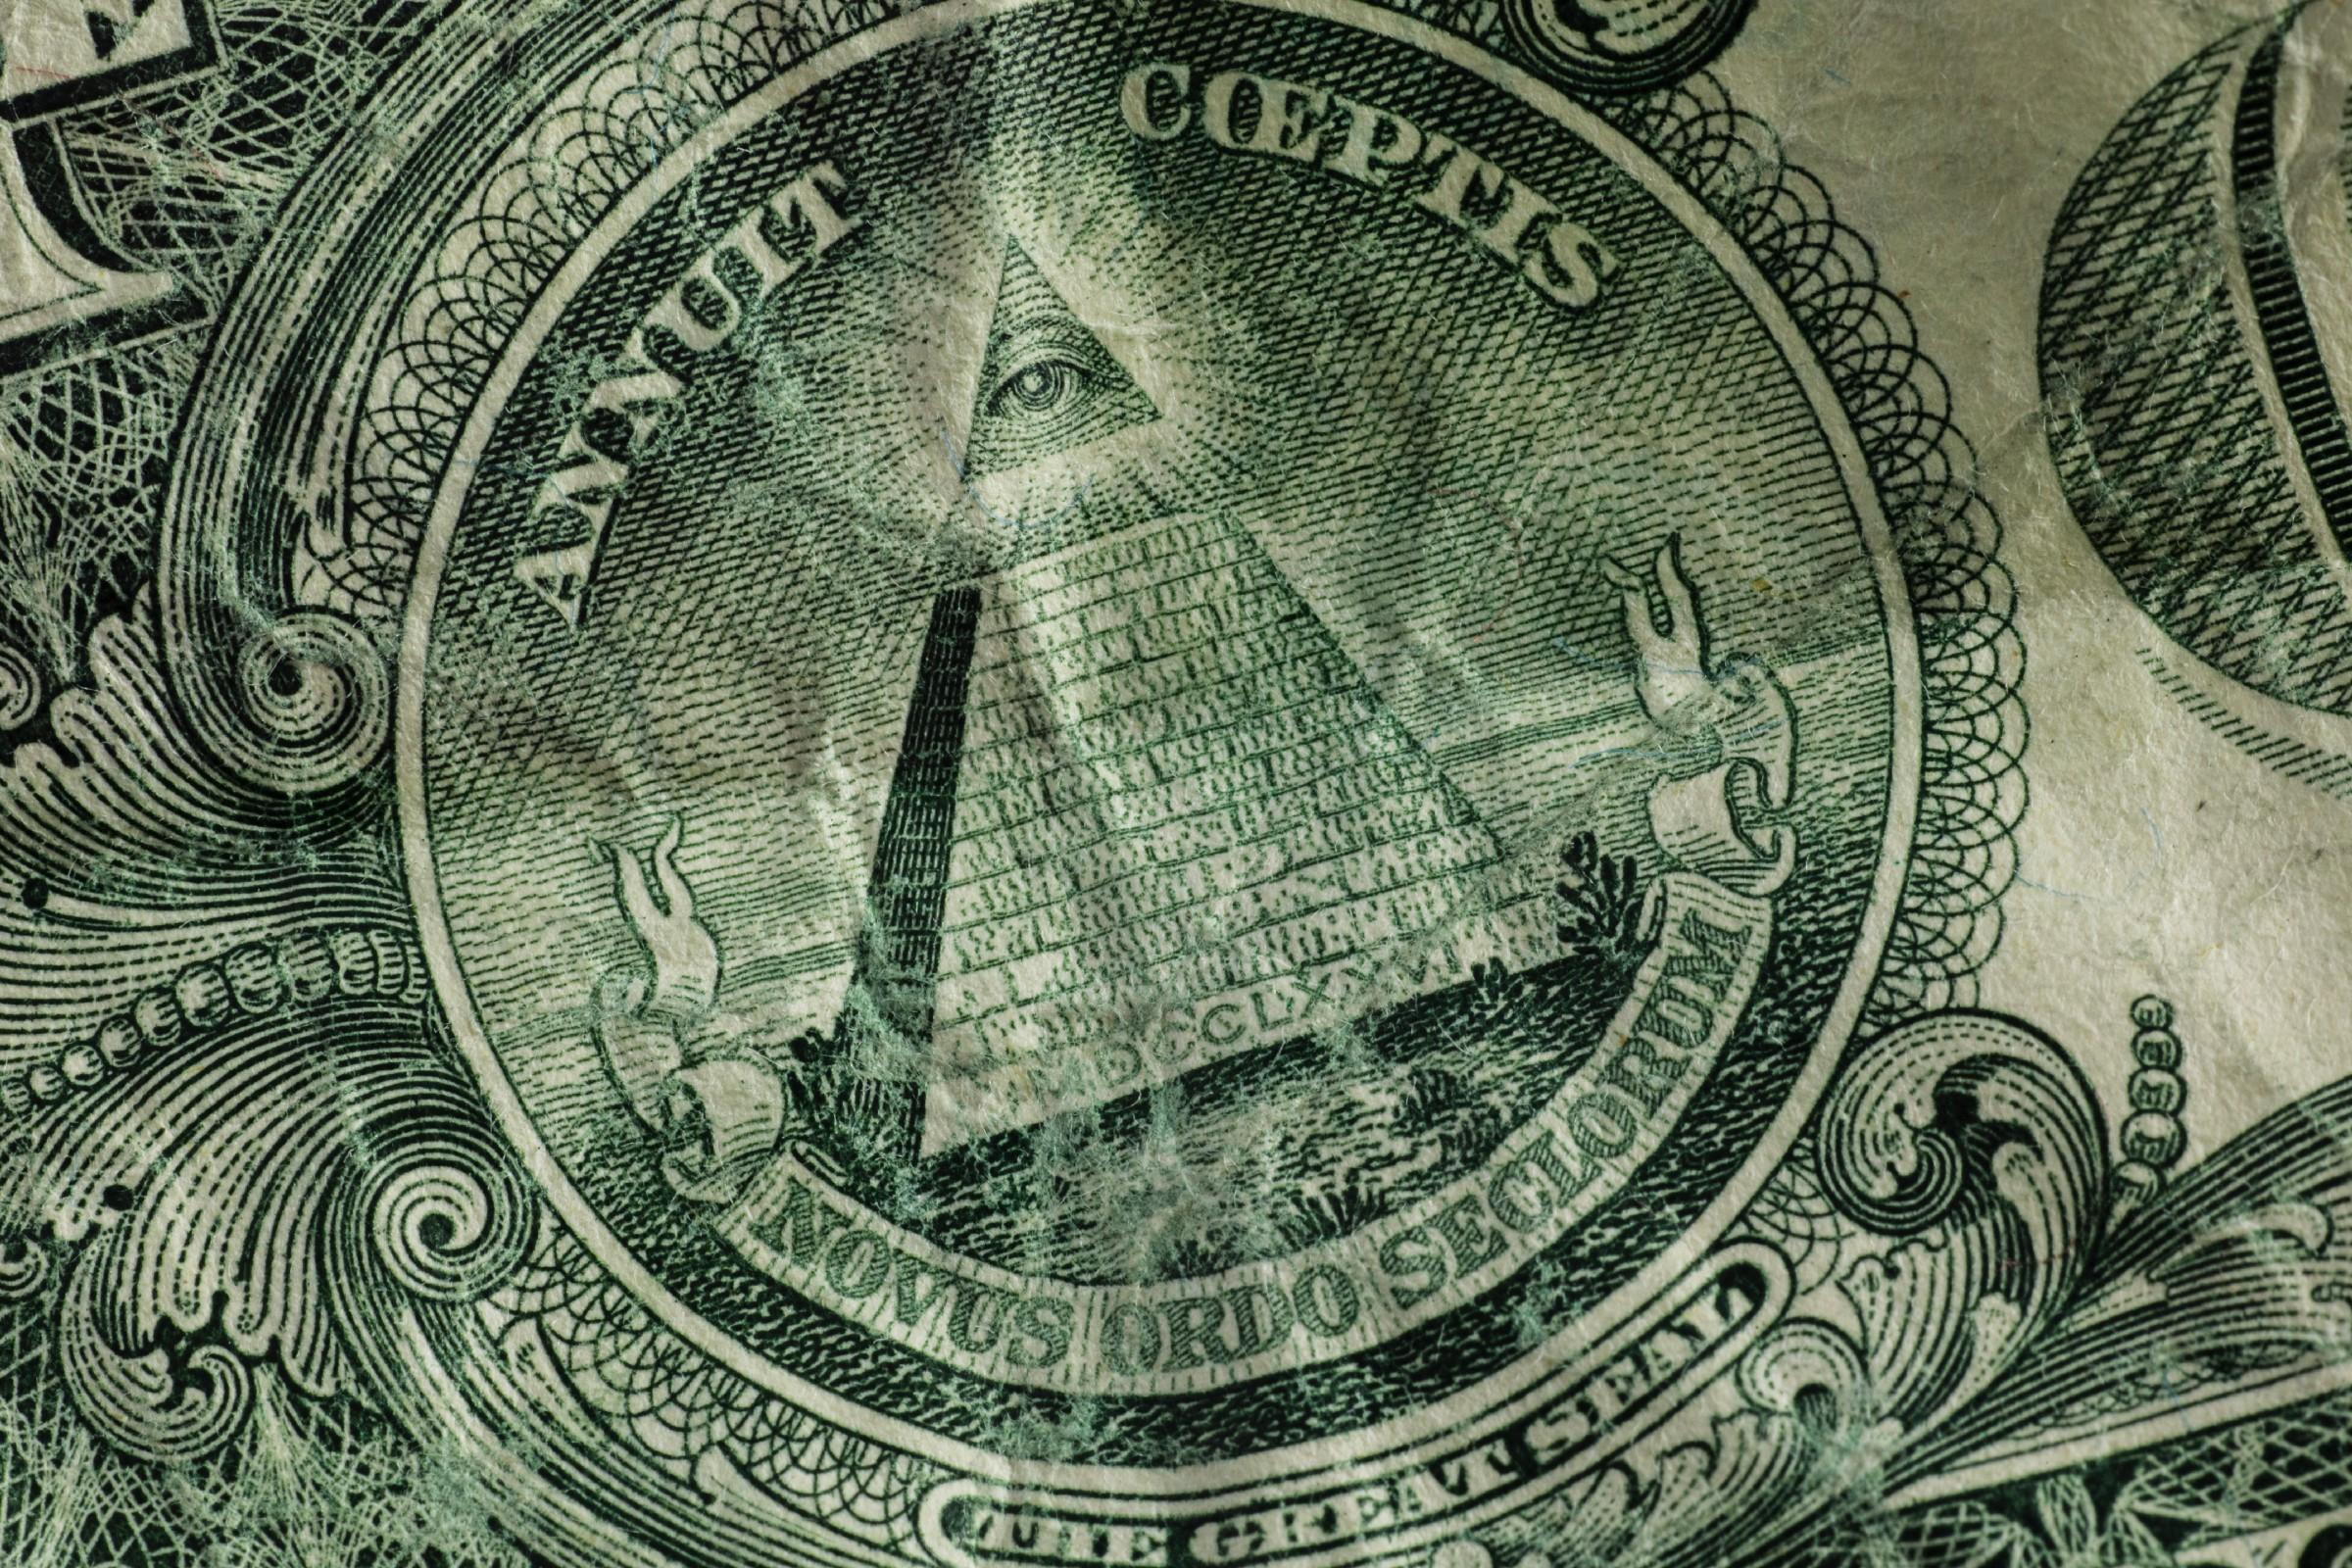 /crypto-investors-owe-the-irs-25-billion-e7855a449dd6 feature image